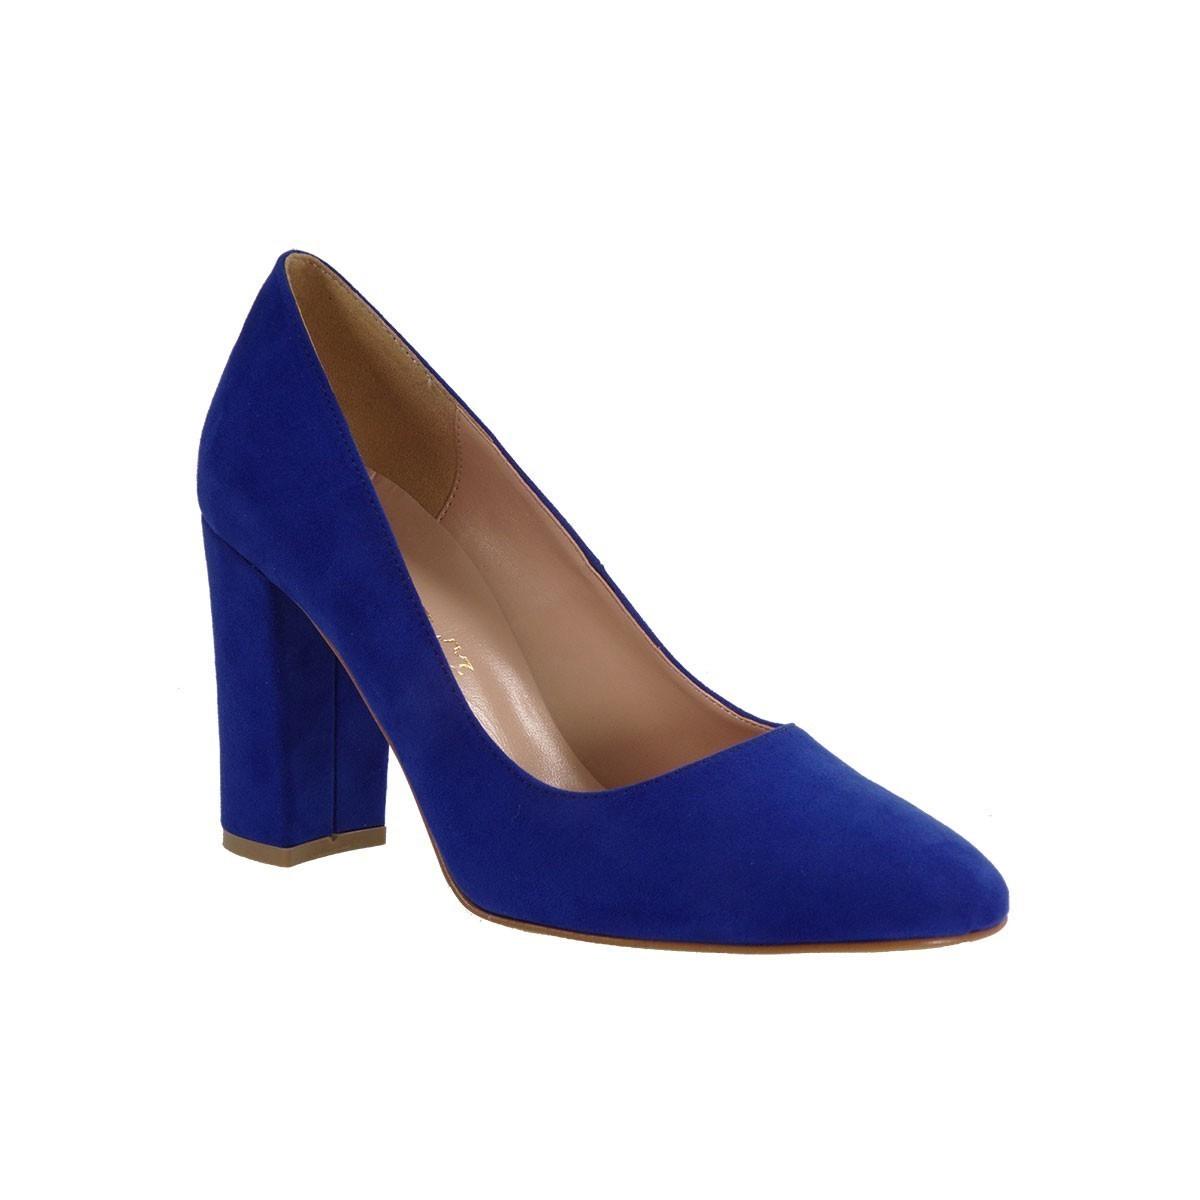 a7beb3436fd Envie Shoes Γυναικείες Παπούτσια Γόβες E02-07415 Μπλέ Καστόρι  Γυναικεία &  Ανδρικά Παπούτσια - BagiotaShoes.gr